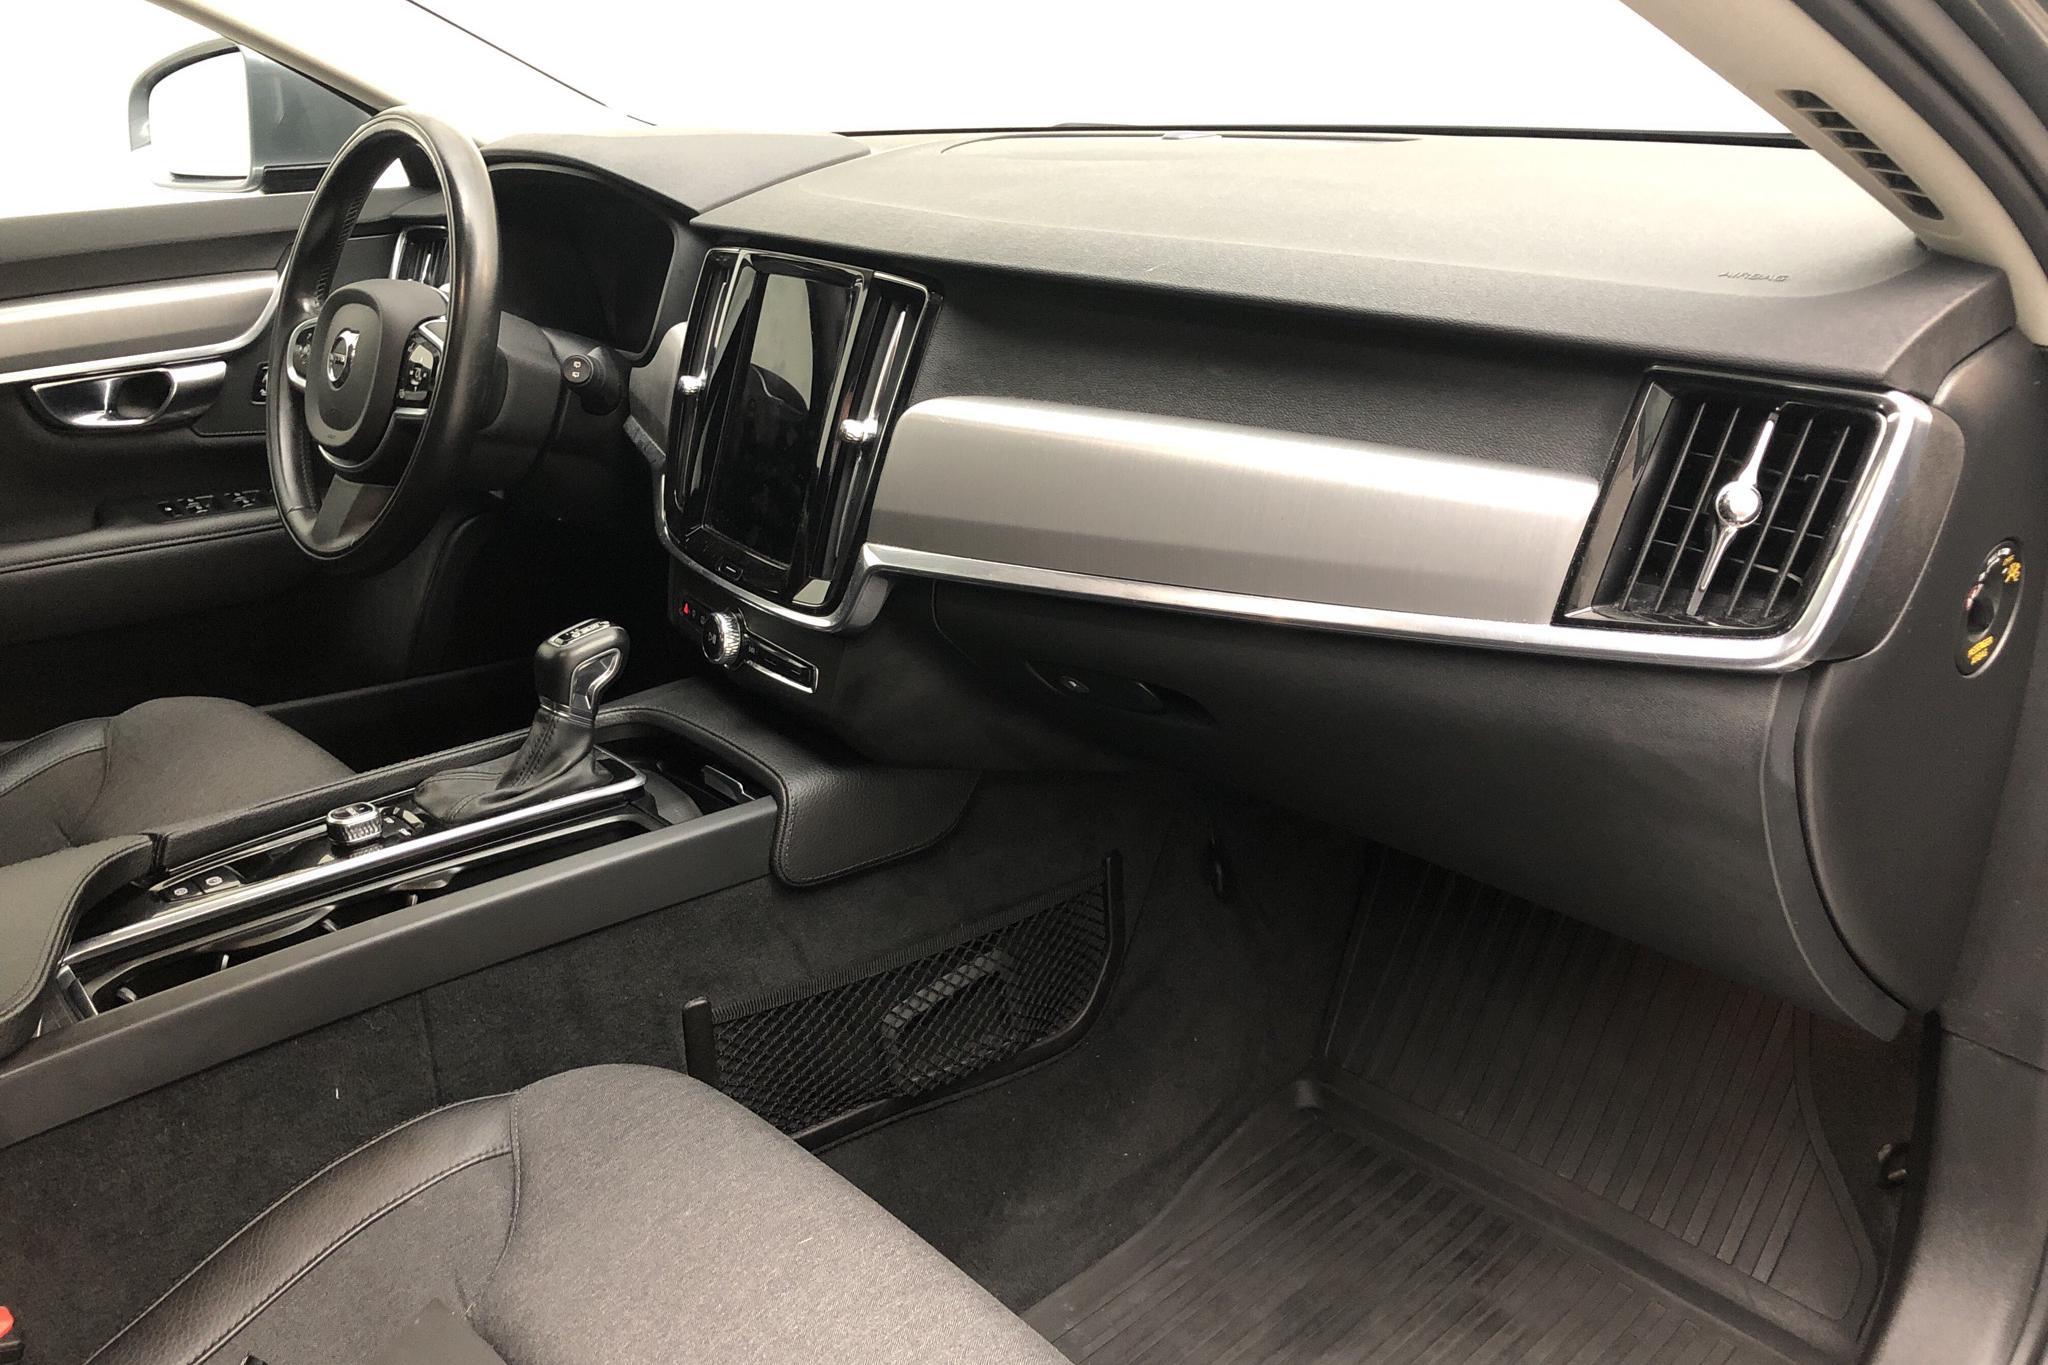 Volvo V90 D4 (190hk) - 144 010 km - Automatic - gray - 2017